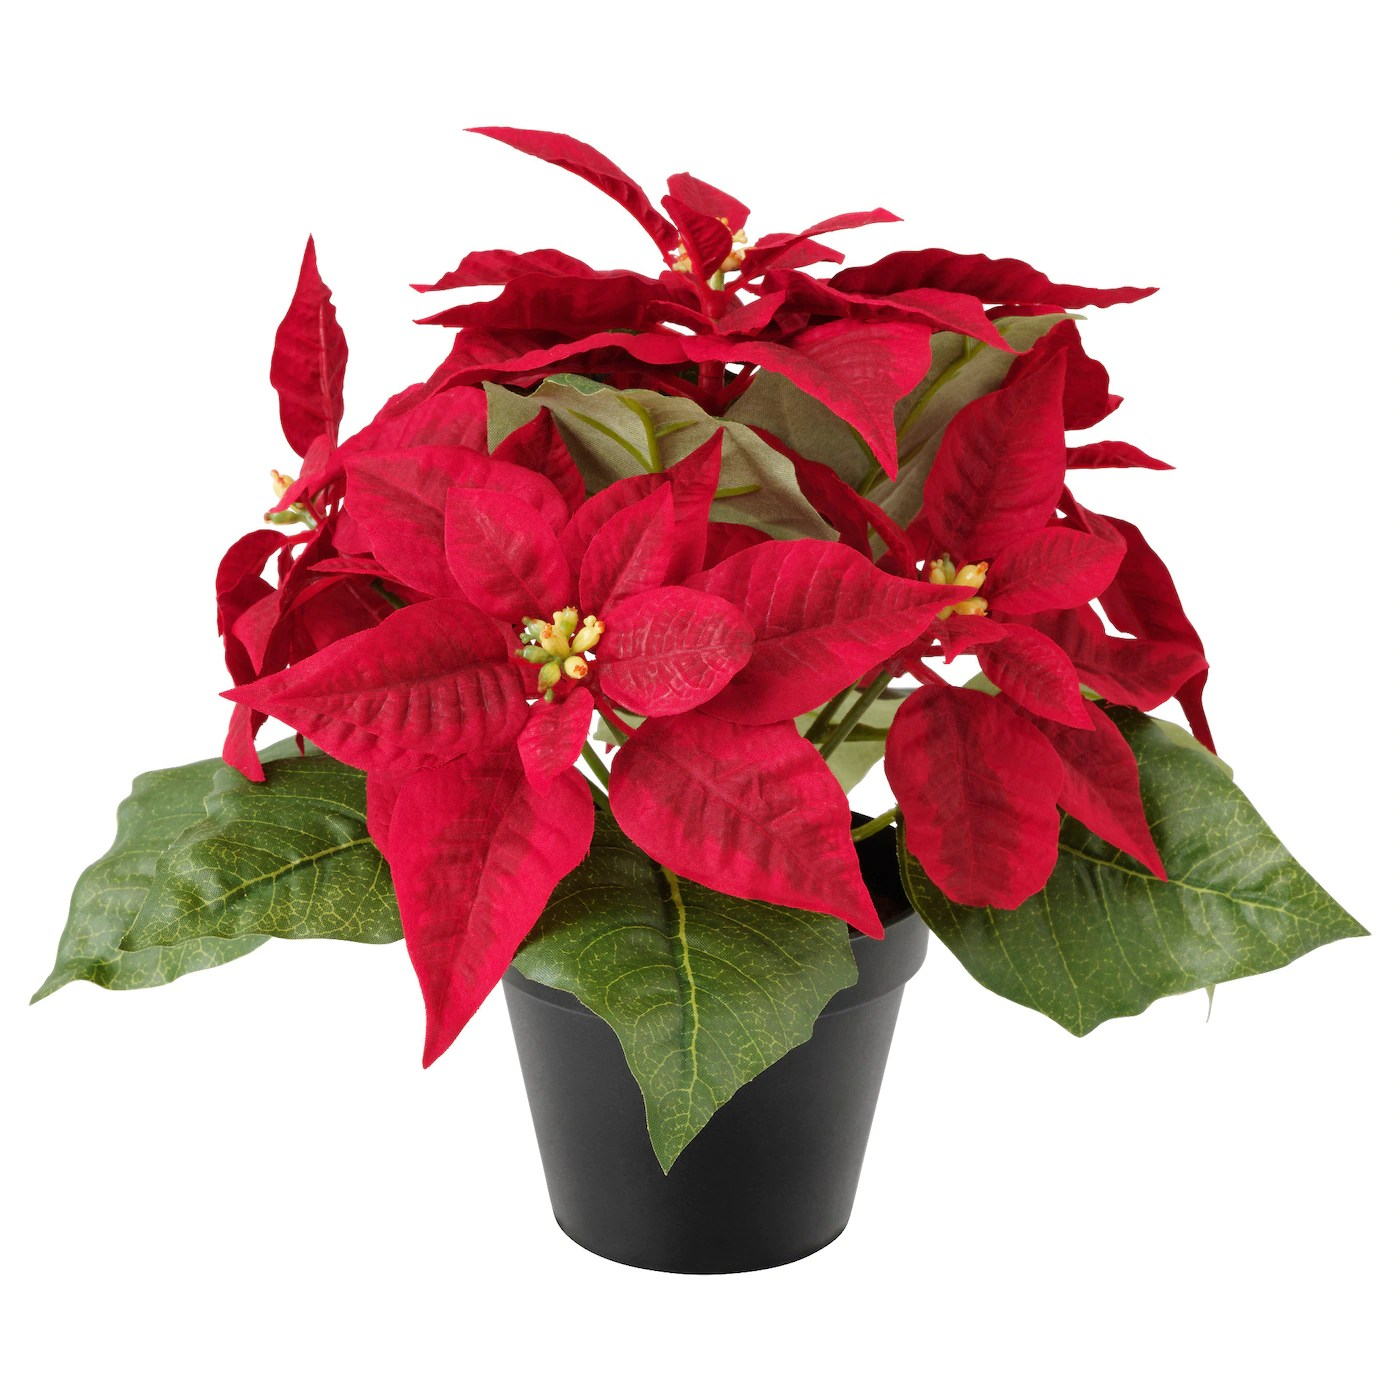 https://i2.wp.com/www.ikea.com/gb/en/images/products/fejka-artificial-potted-plant-poinsettia-red__0538278_pe651824_s5.jpg